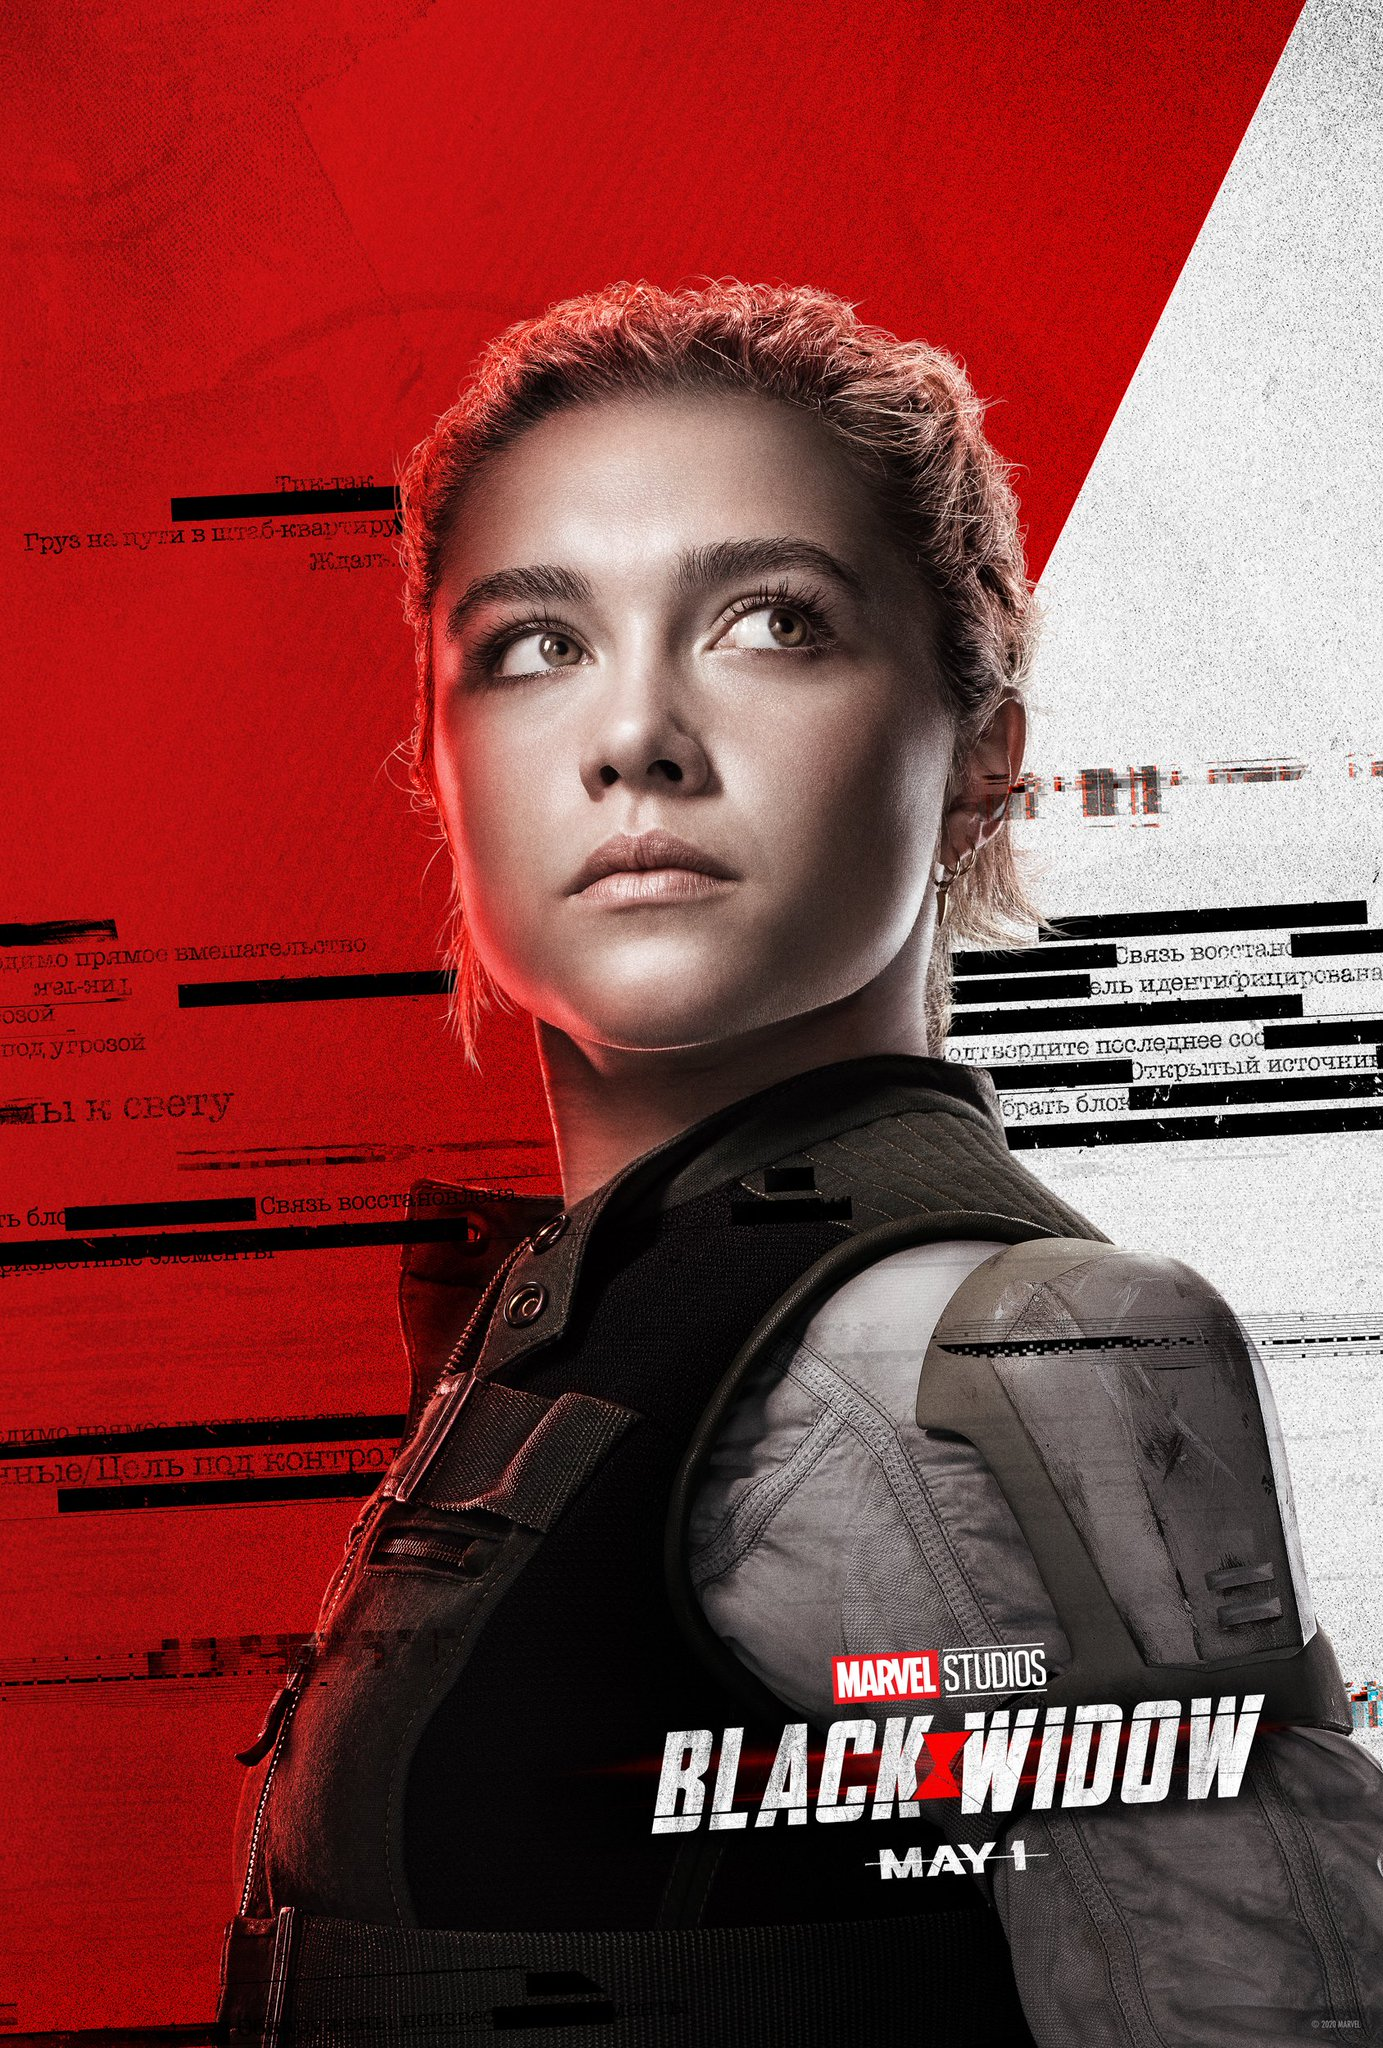 Black Widow (film) poster 005.jpg